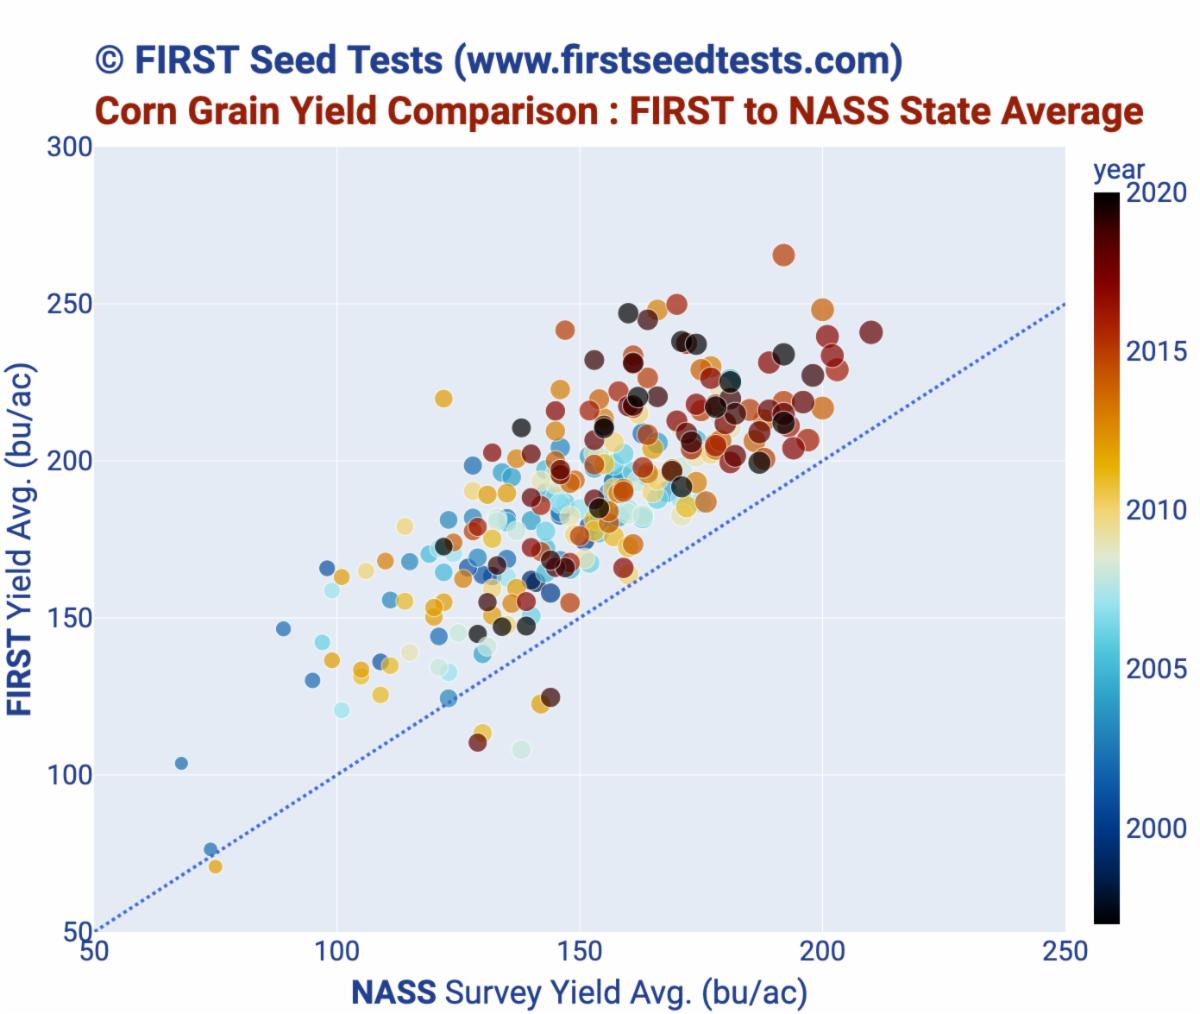 Corn Grain Yield NASS to FIRST comparison